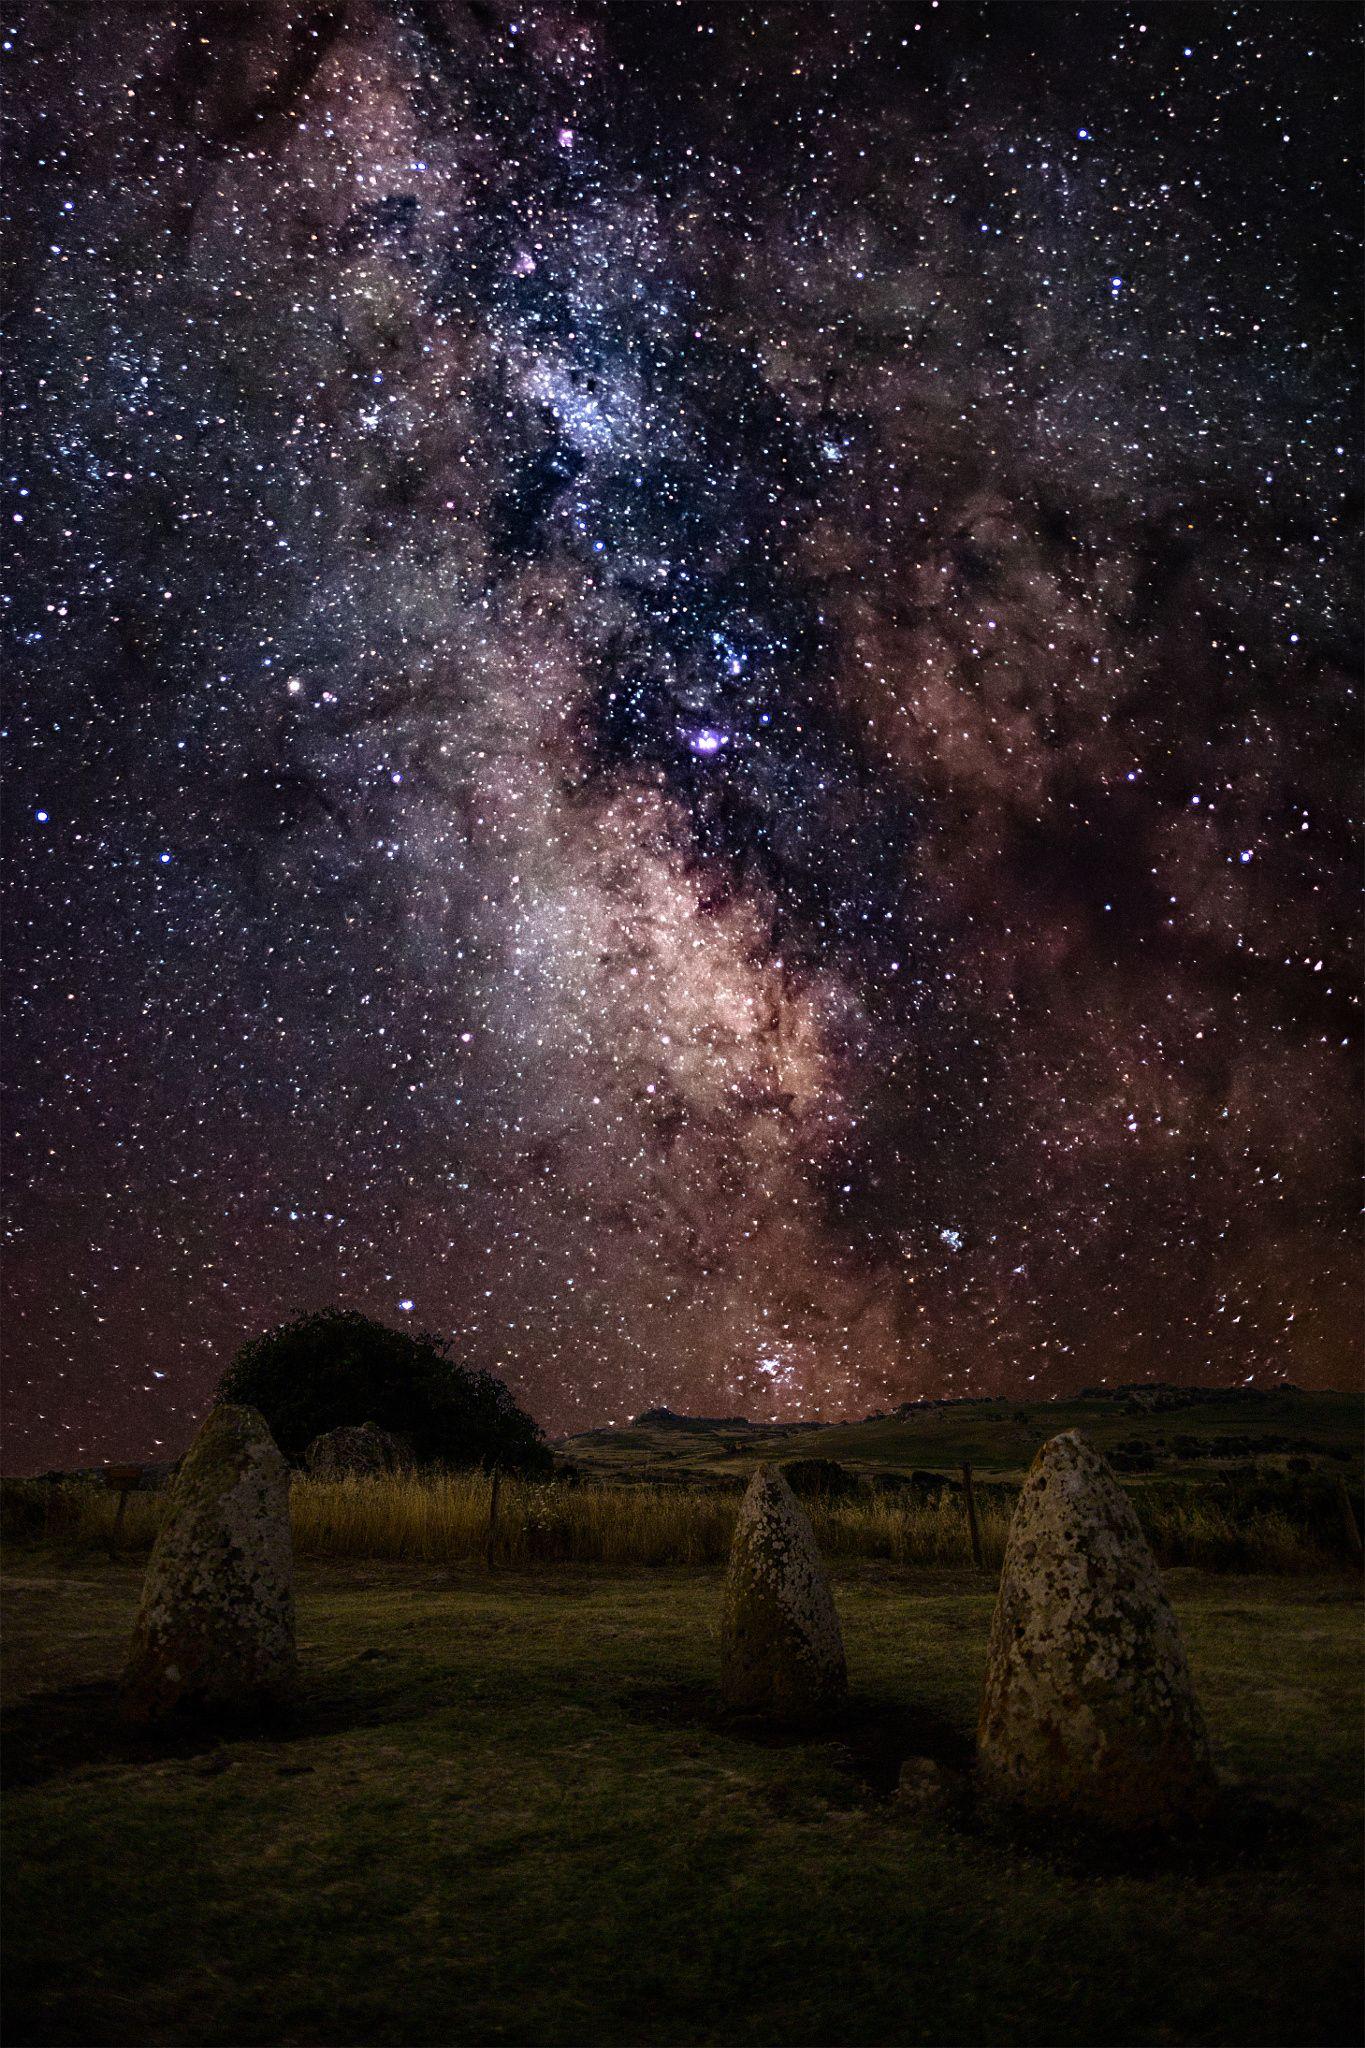 Nuragic Milkyway By Luka180 Landscape Night Italy Sardinia Stars Post Ancient Milkyway Sardegna Nightphotography Sky Photos Night Skies Milky Way